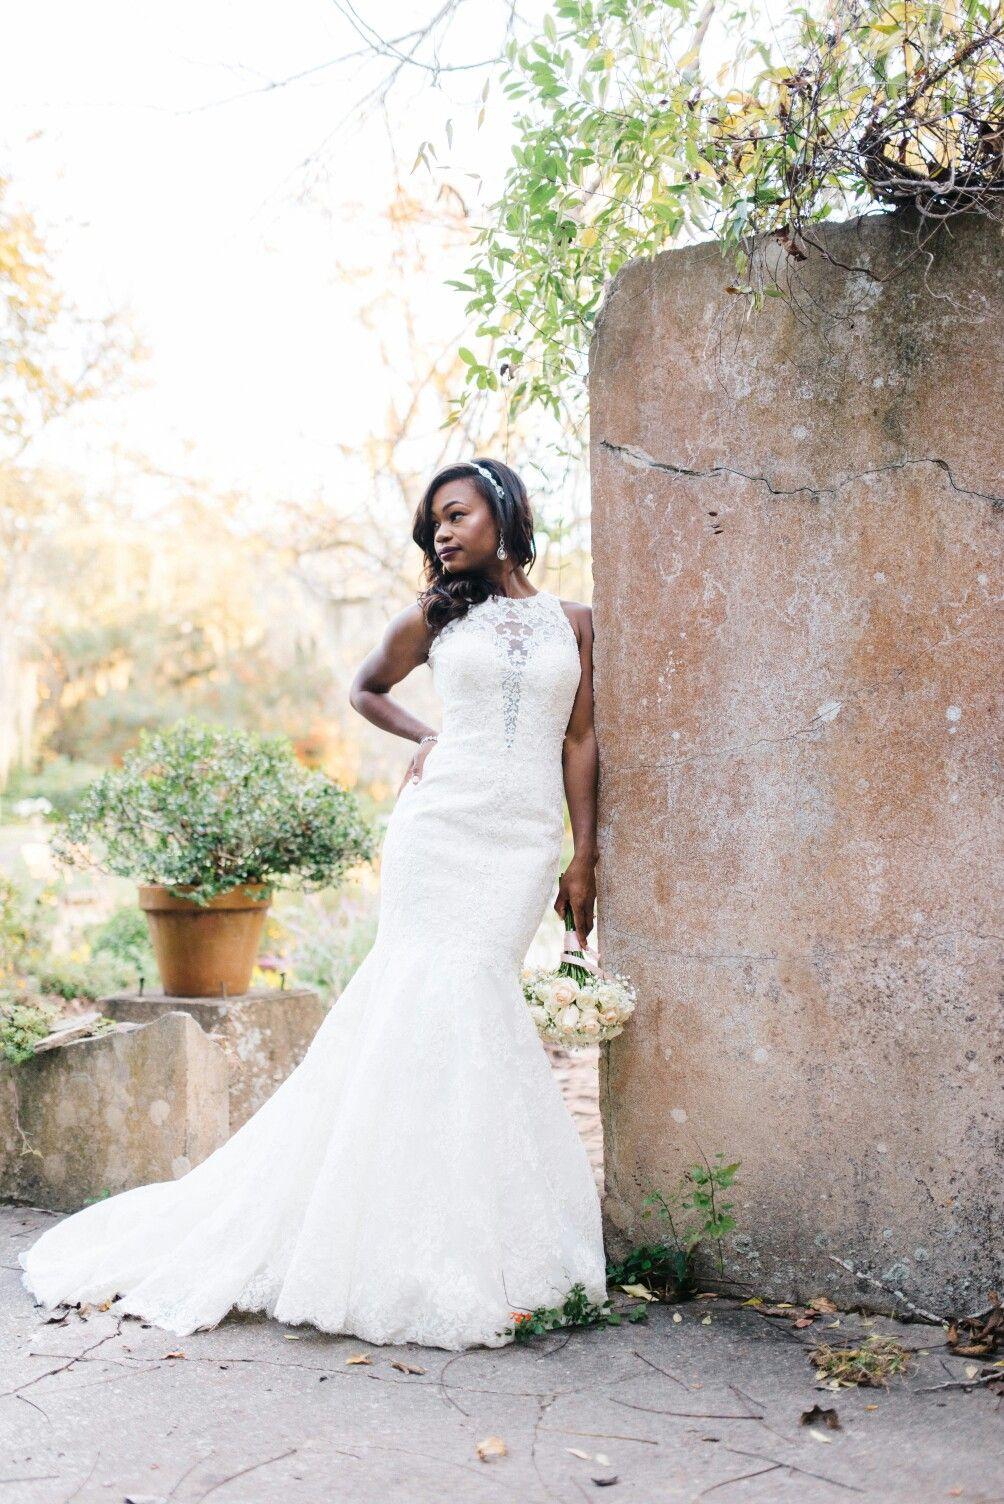 Trinity Damian S Wedding Wedding Black Bride Wedding Dresses